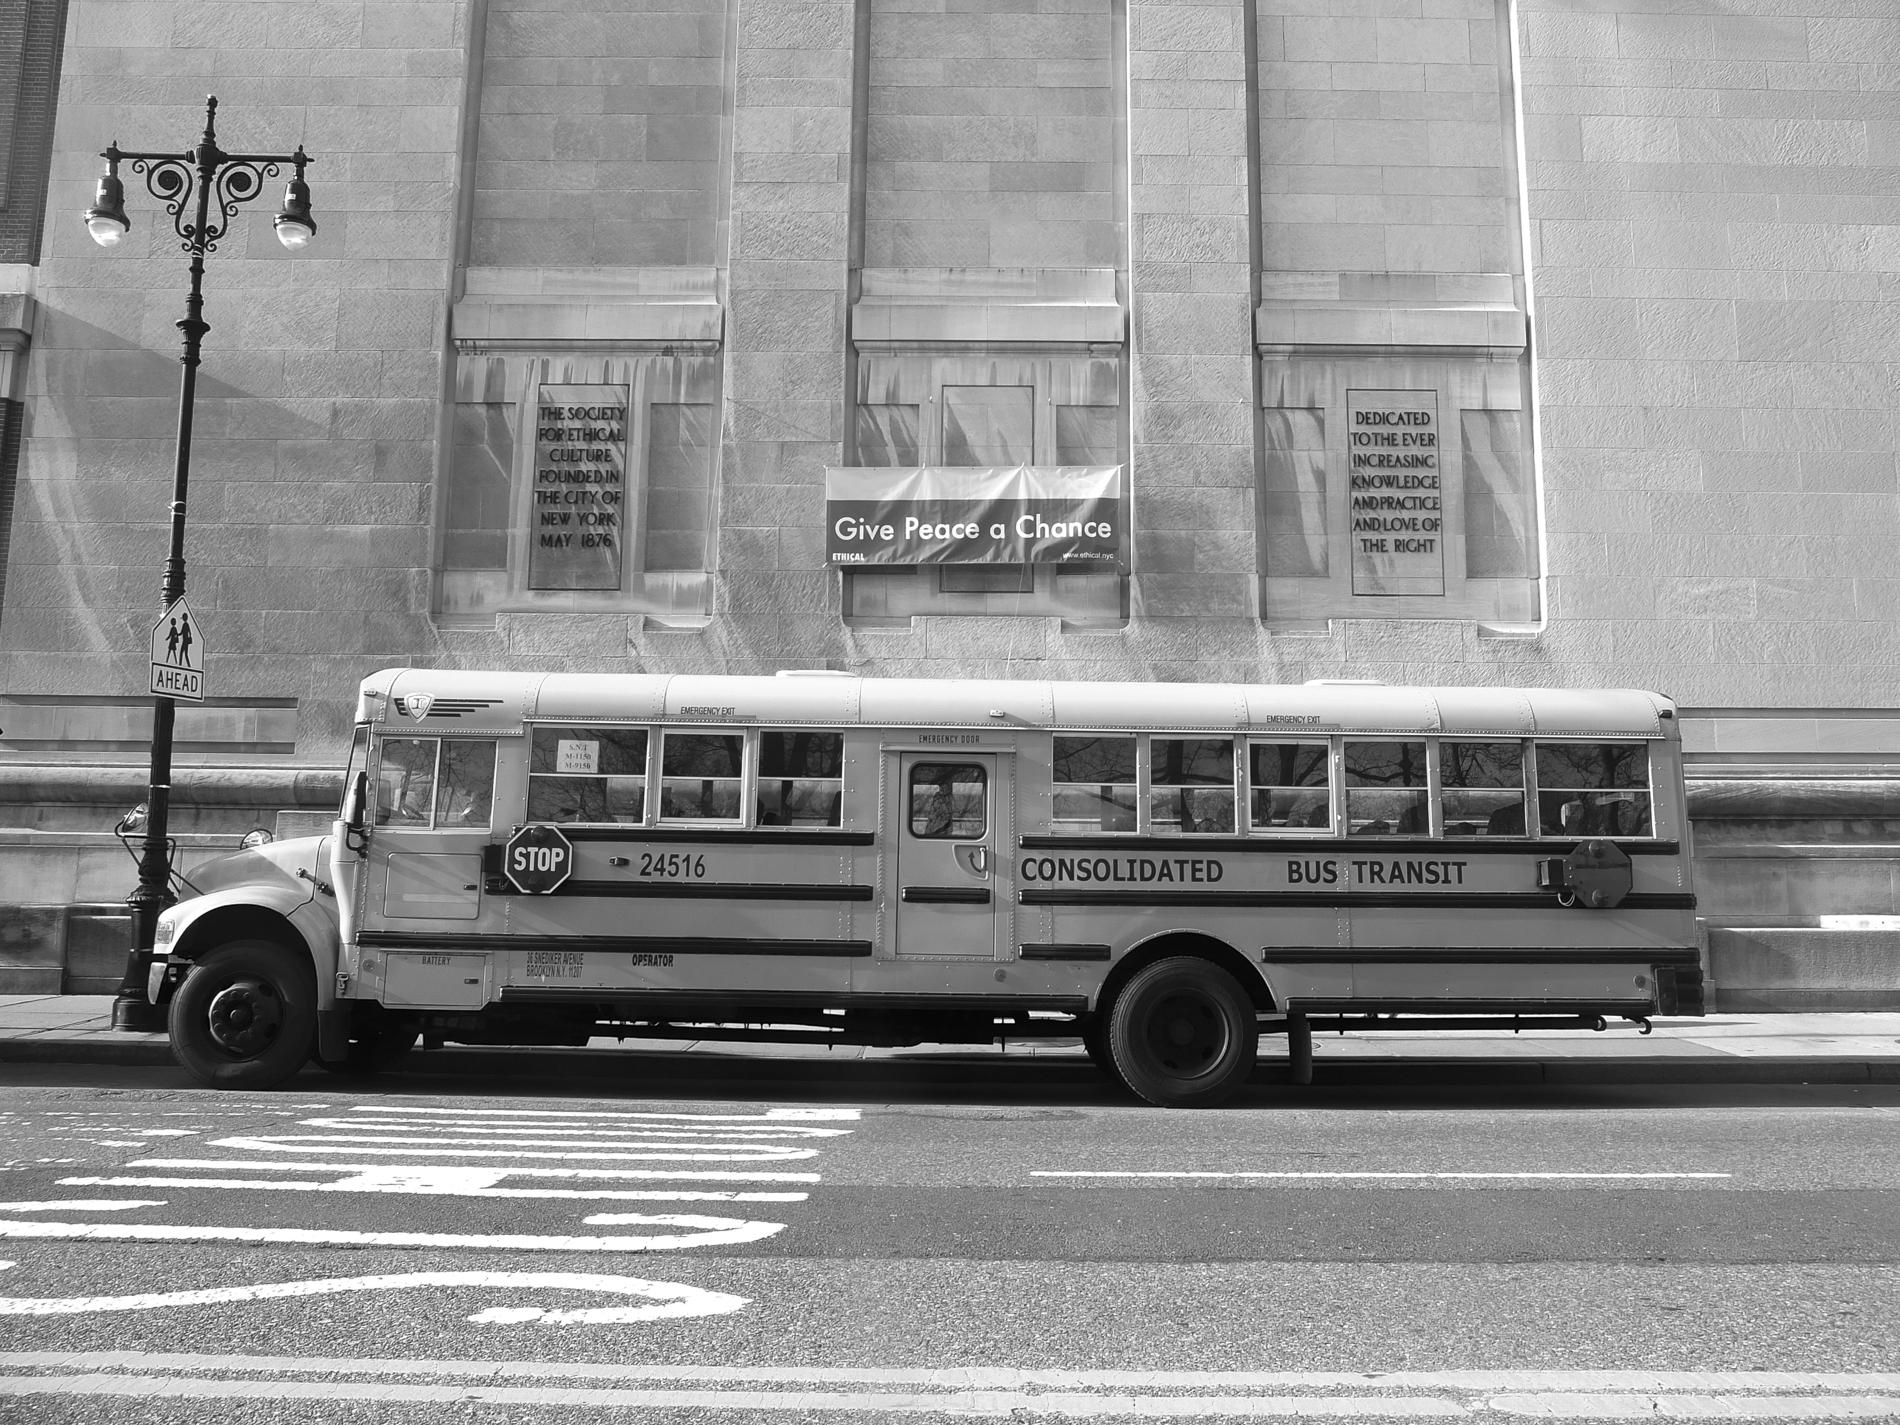 New York School Bus @ Central Park